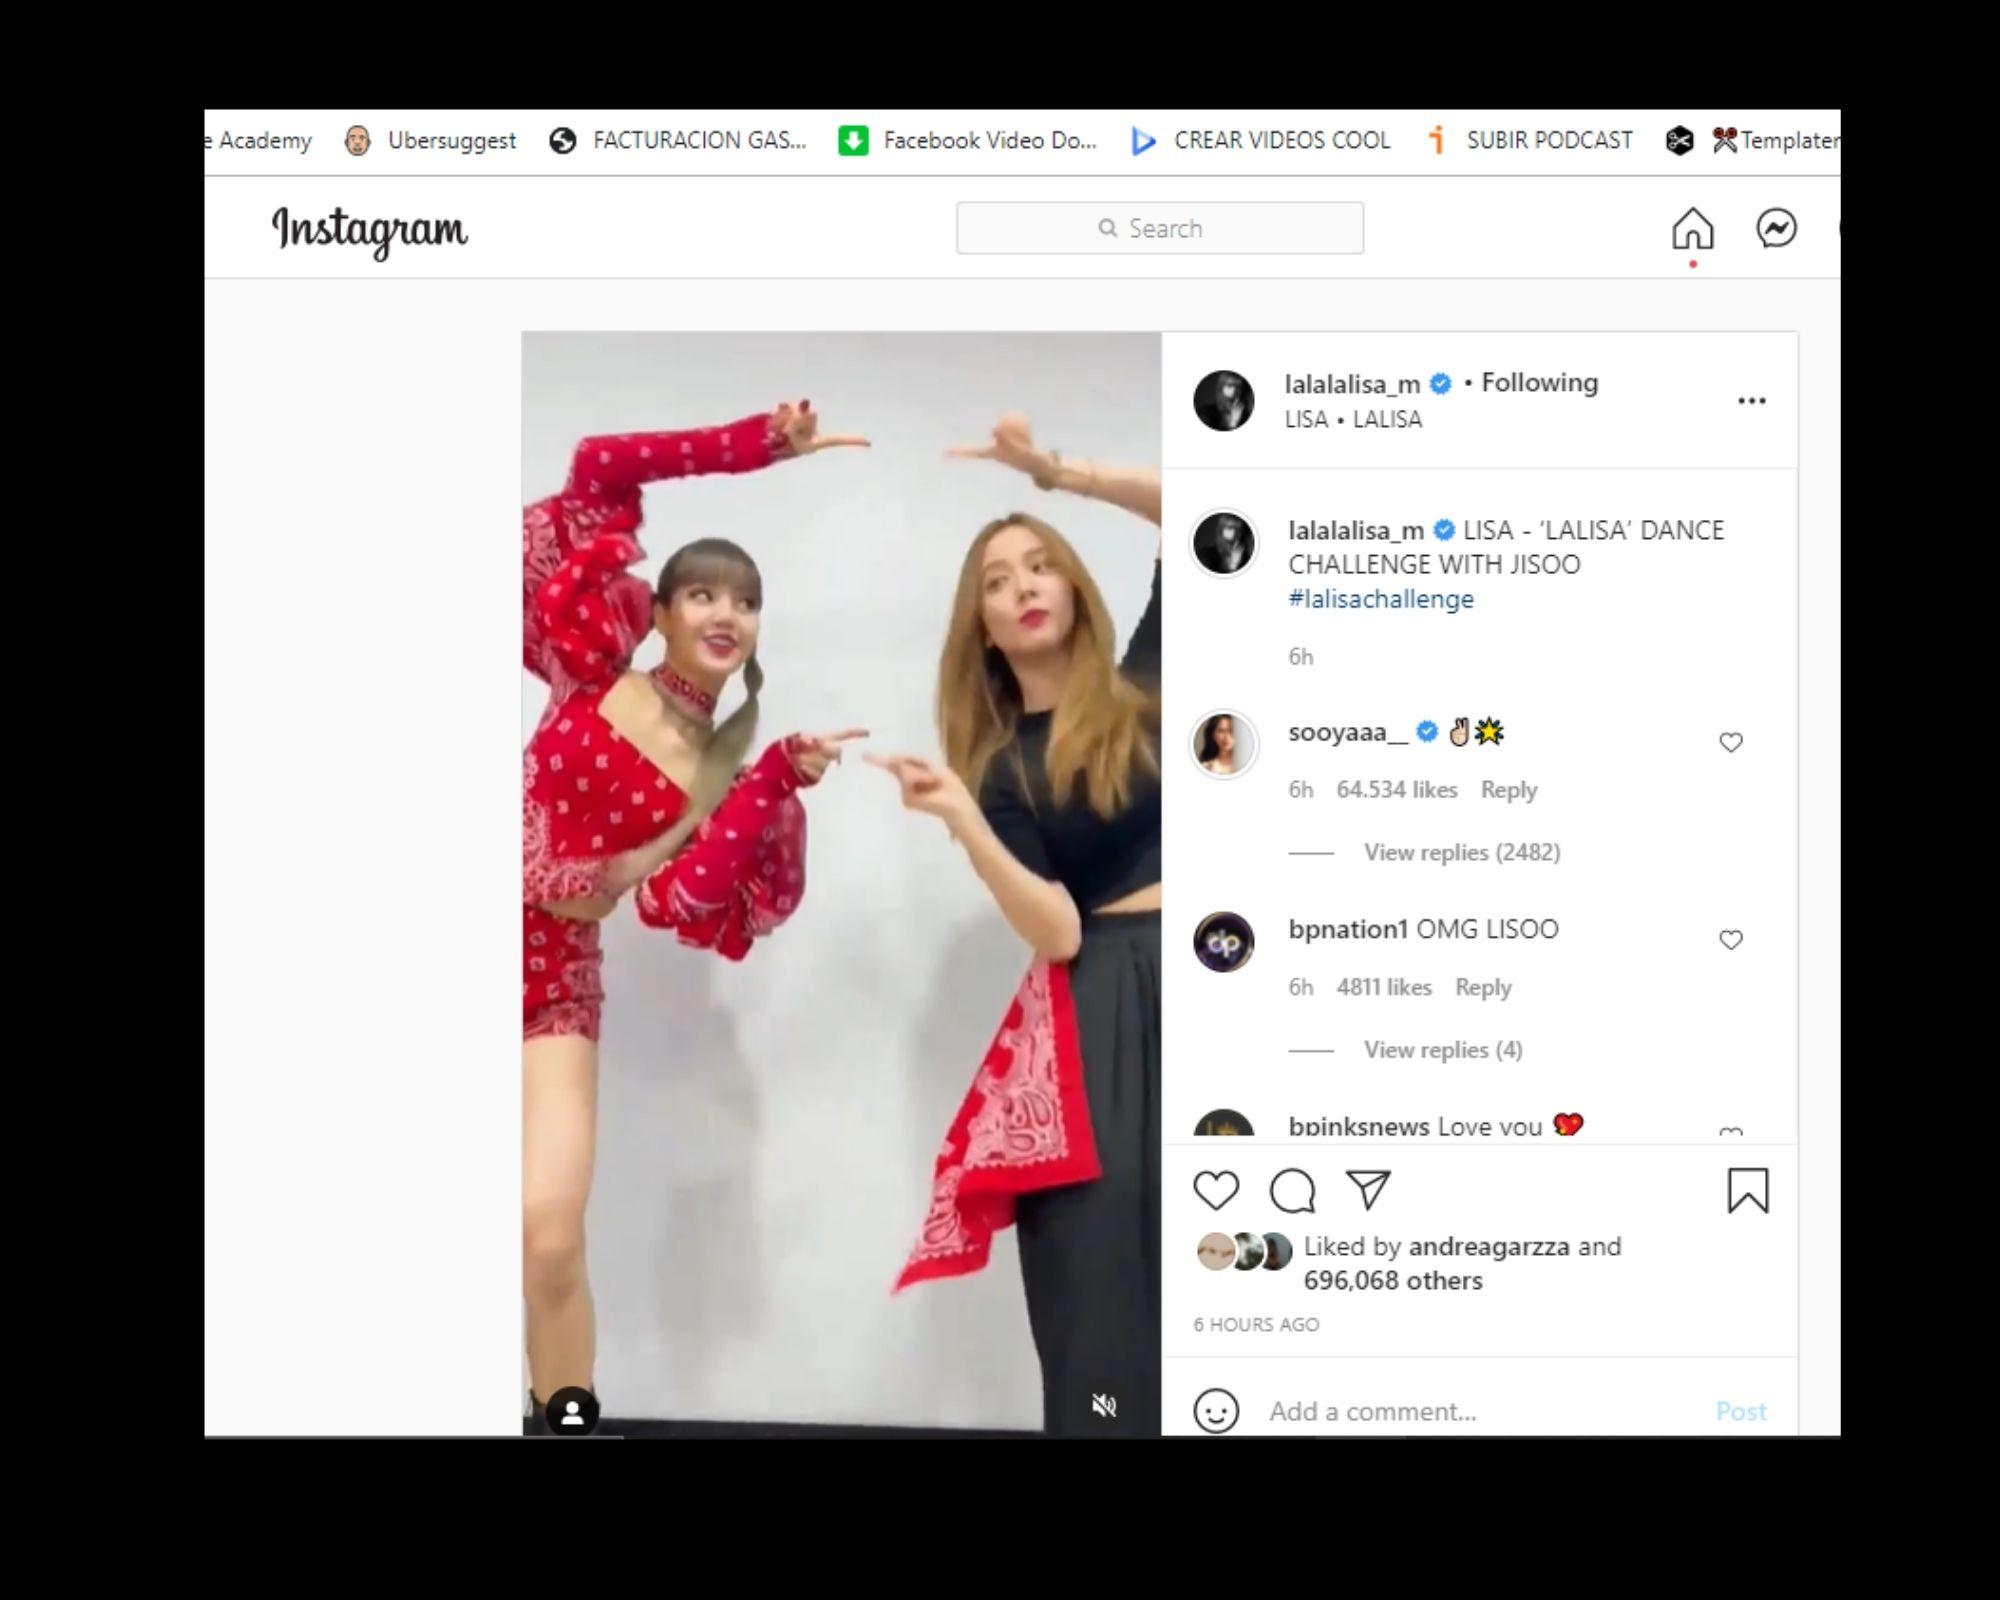 https://www.instagram.com/reel/CUNDJlUDD_9/?utm_medium=copy_link